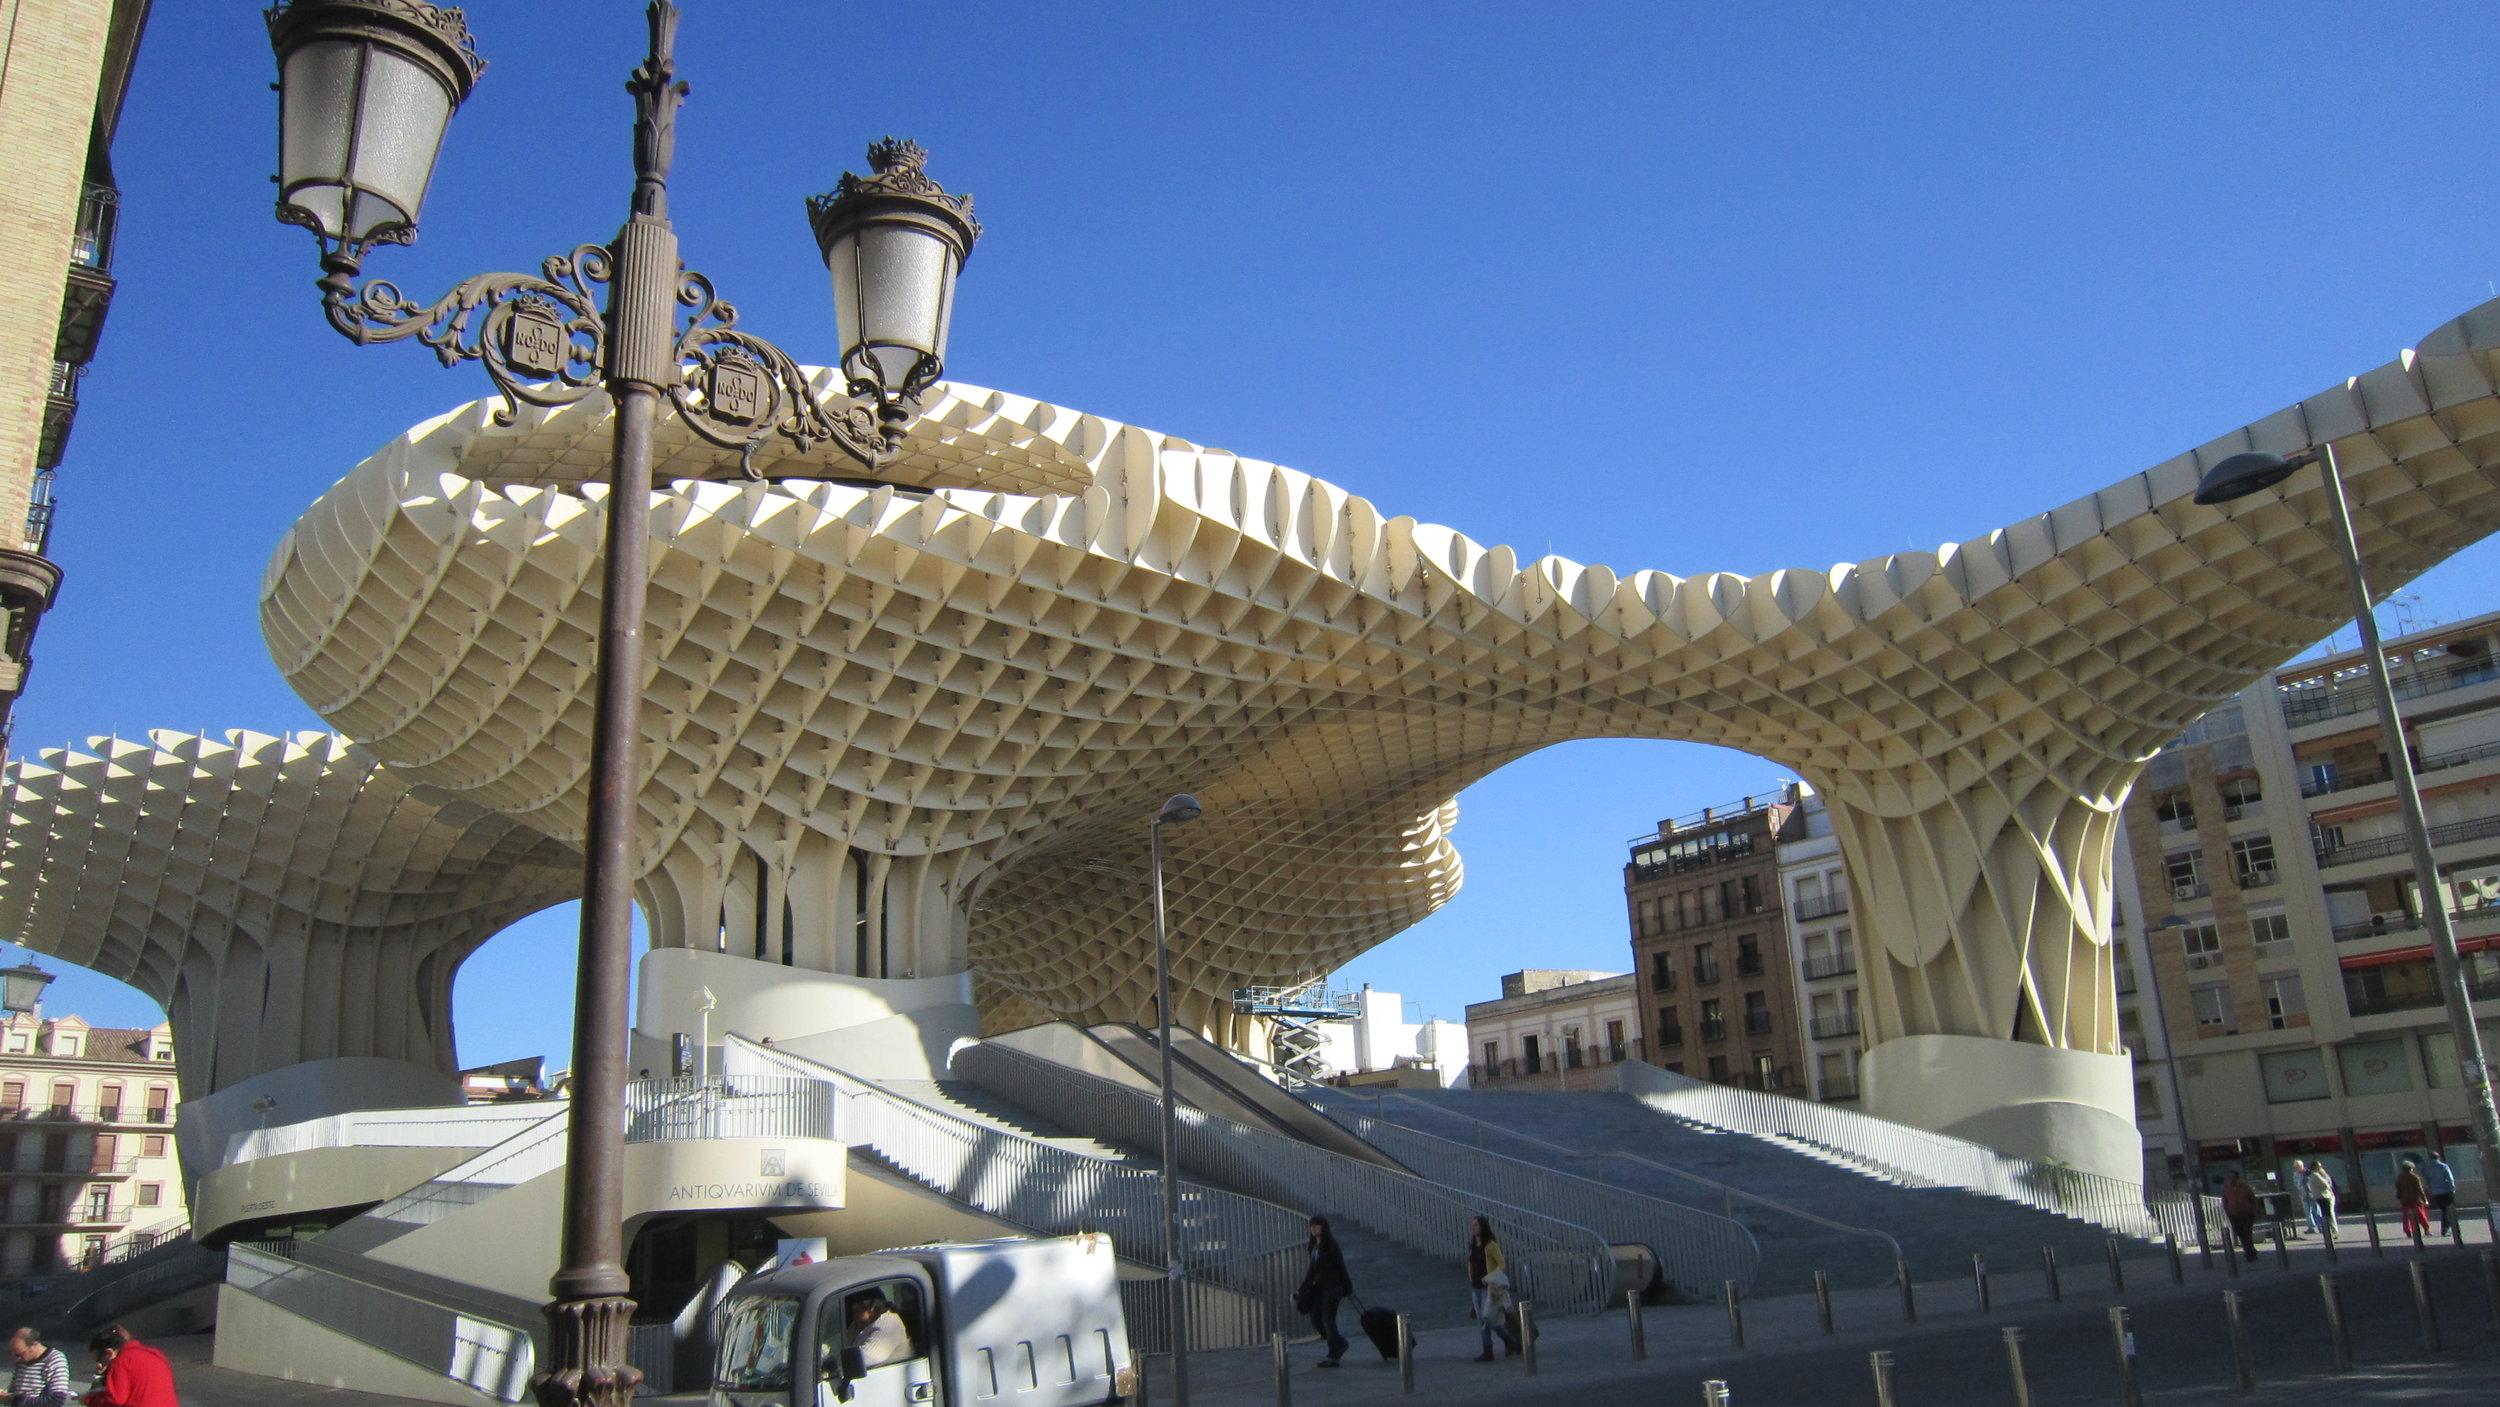 Seville's interesting Metropol Parasol.